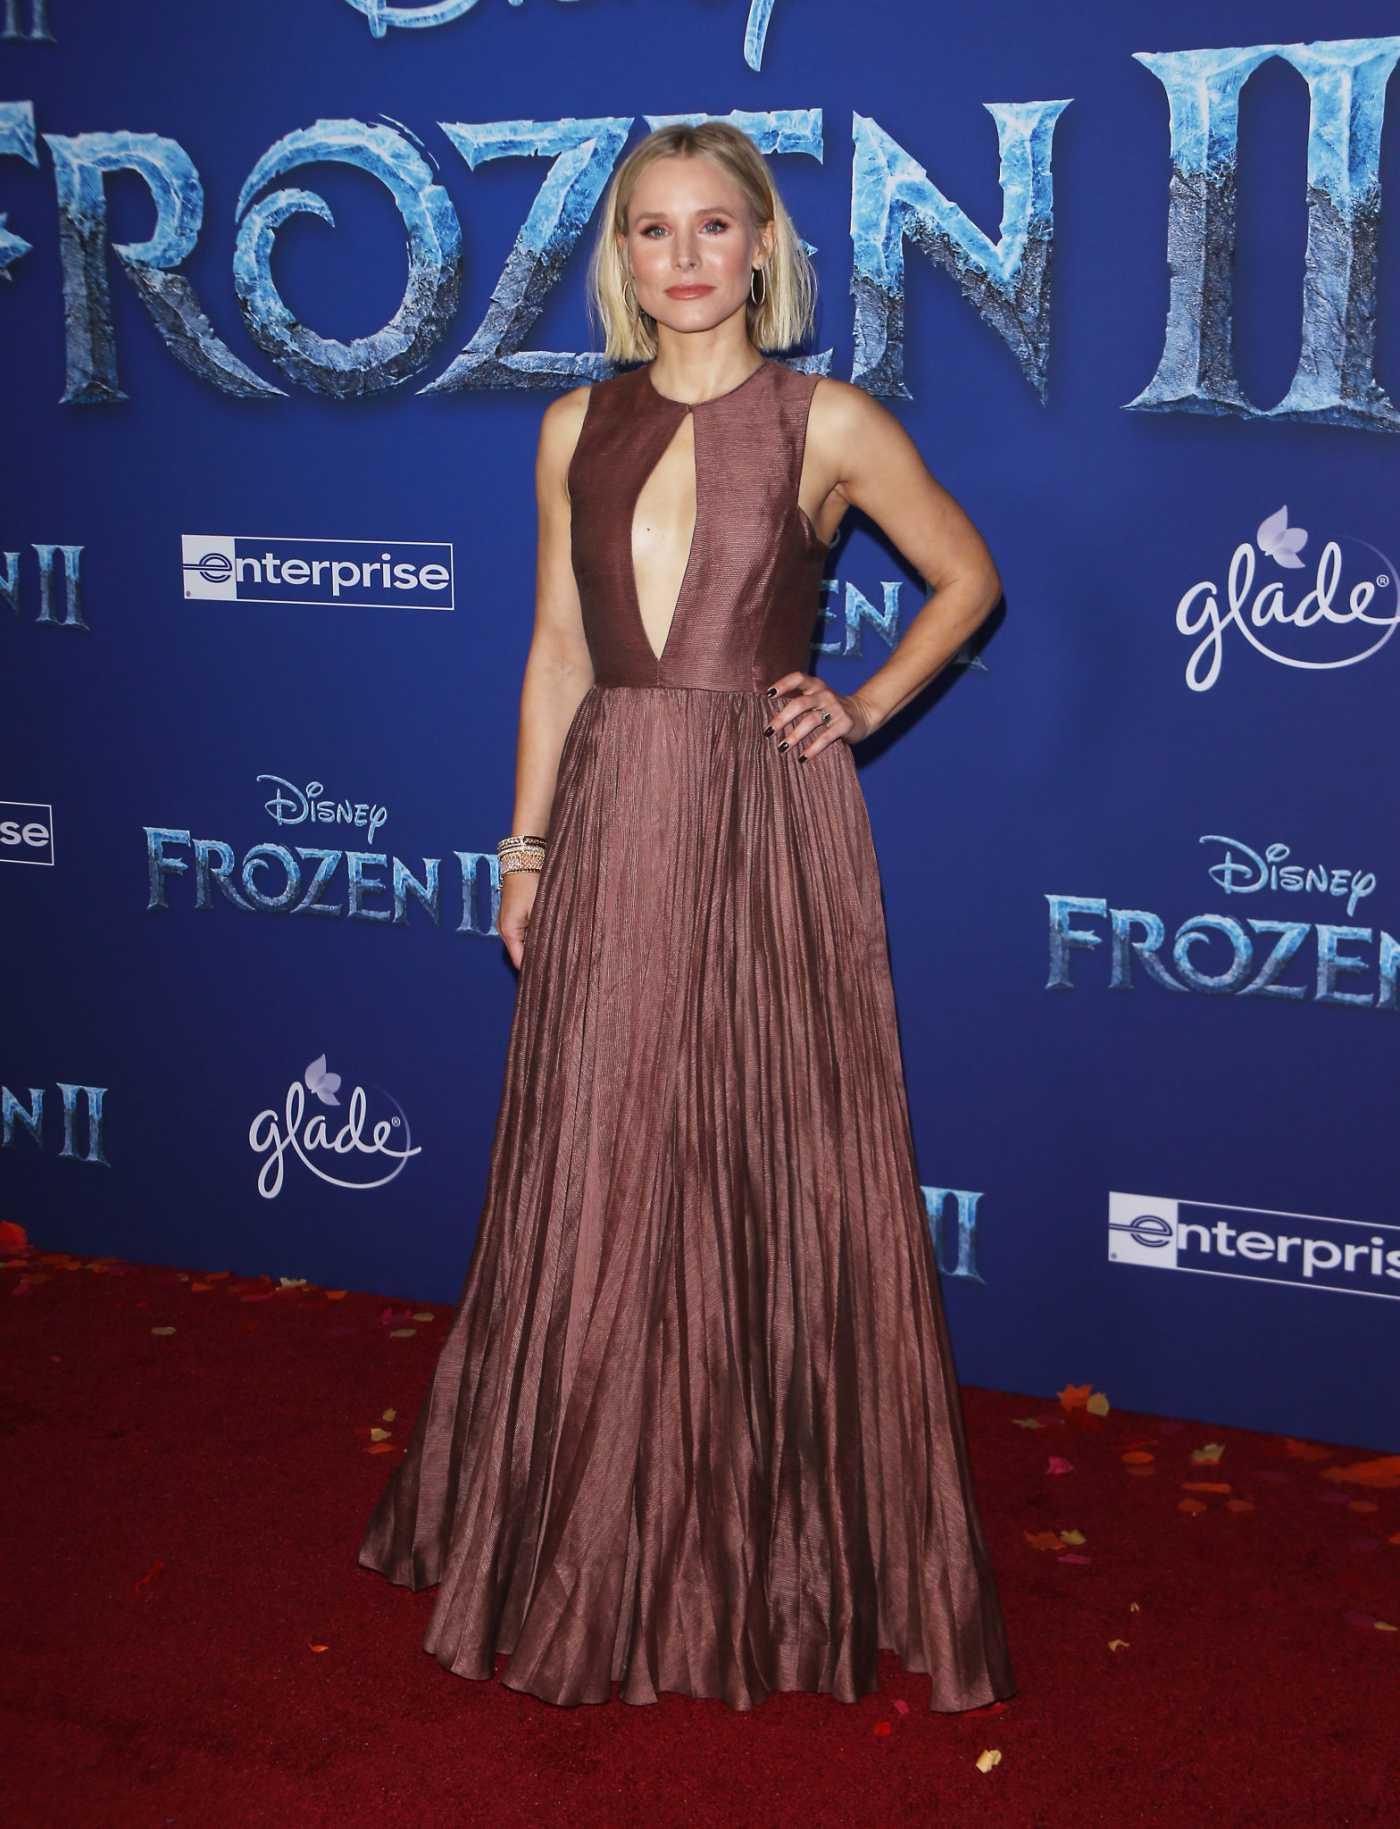 Kristen Bell Attends the Frozen 2 Premiere in Hollywood 11/07/2019